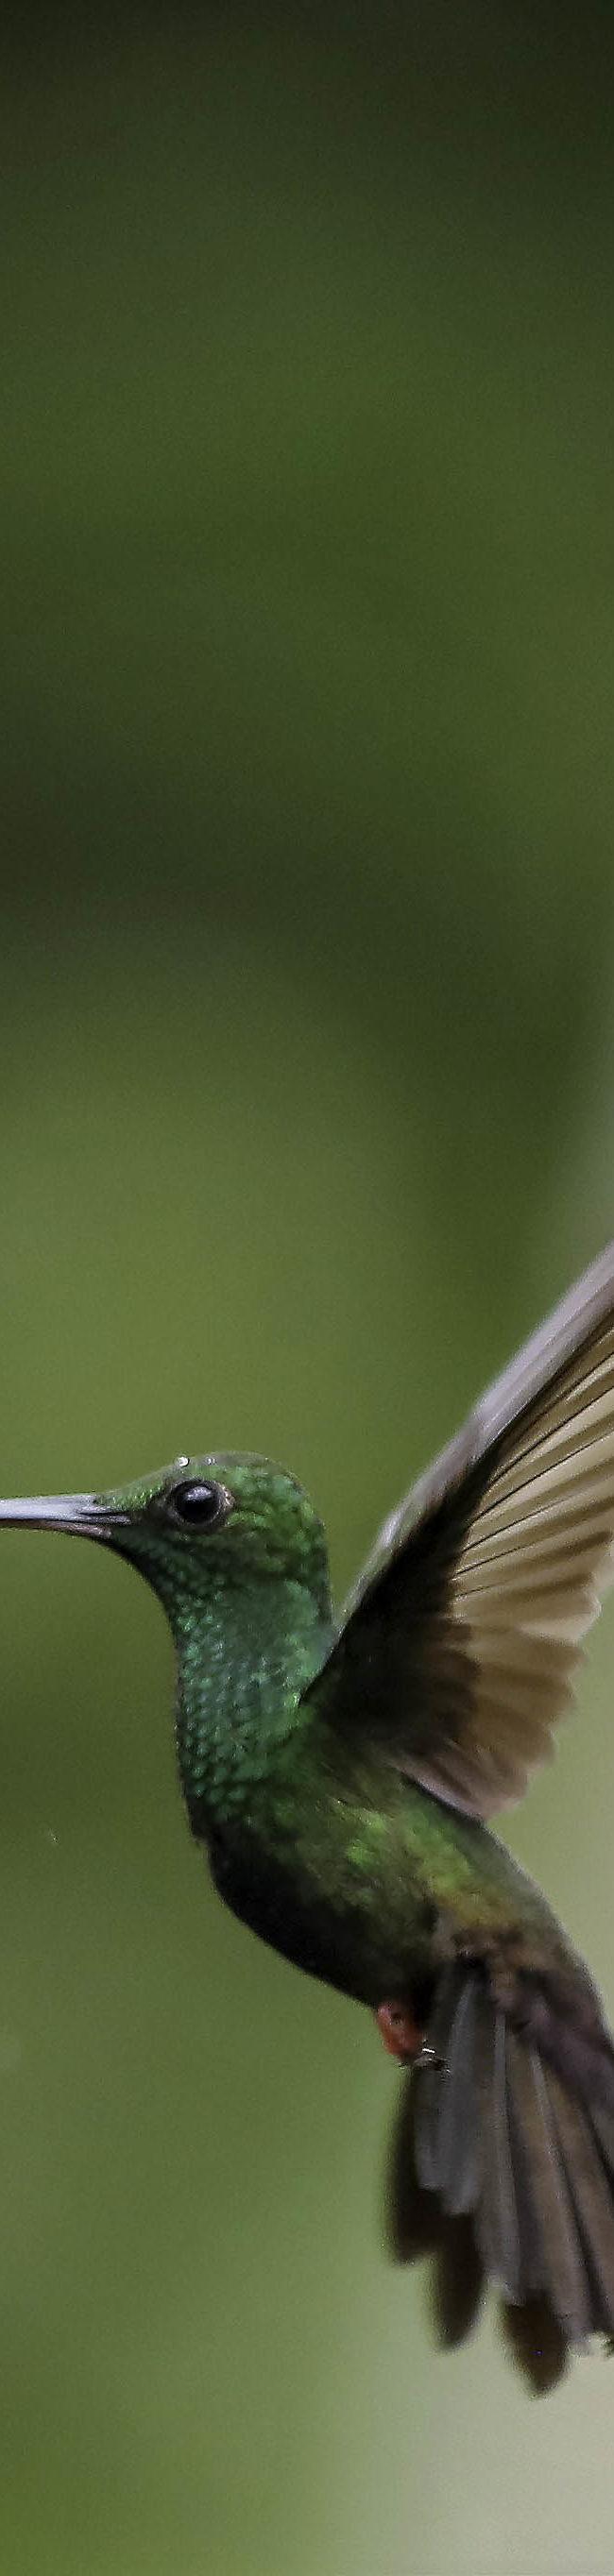 Bronsstaartpluimkolibrie / Bronze-tailed Plumeleteer (Chalybura urochrysia)